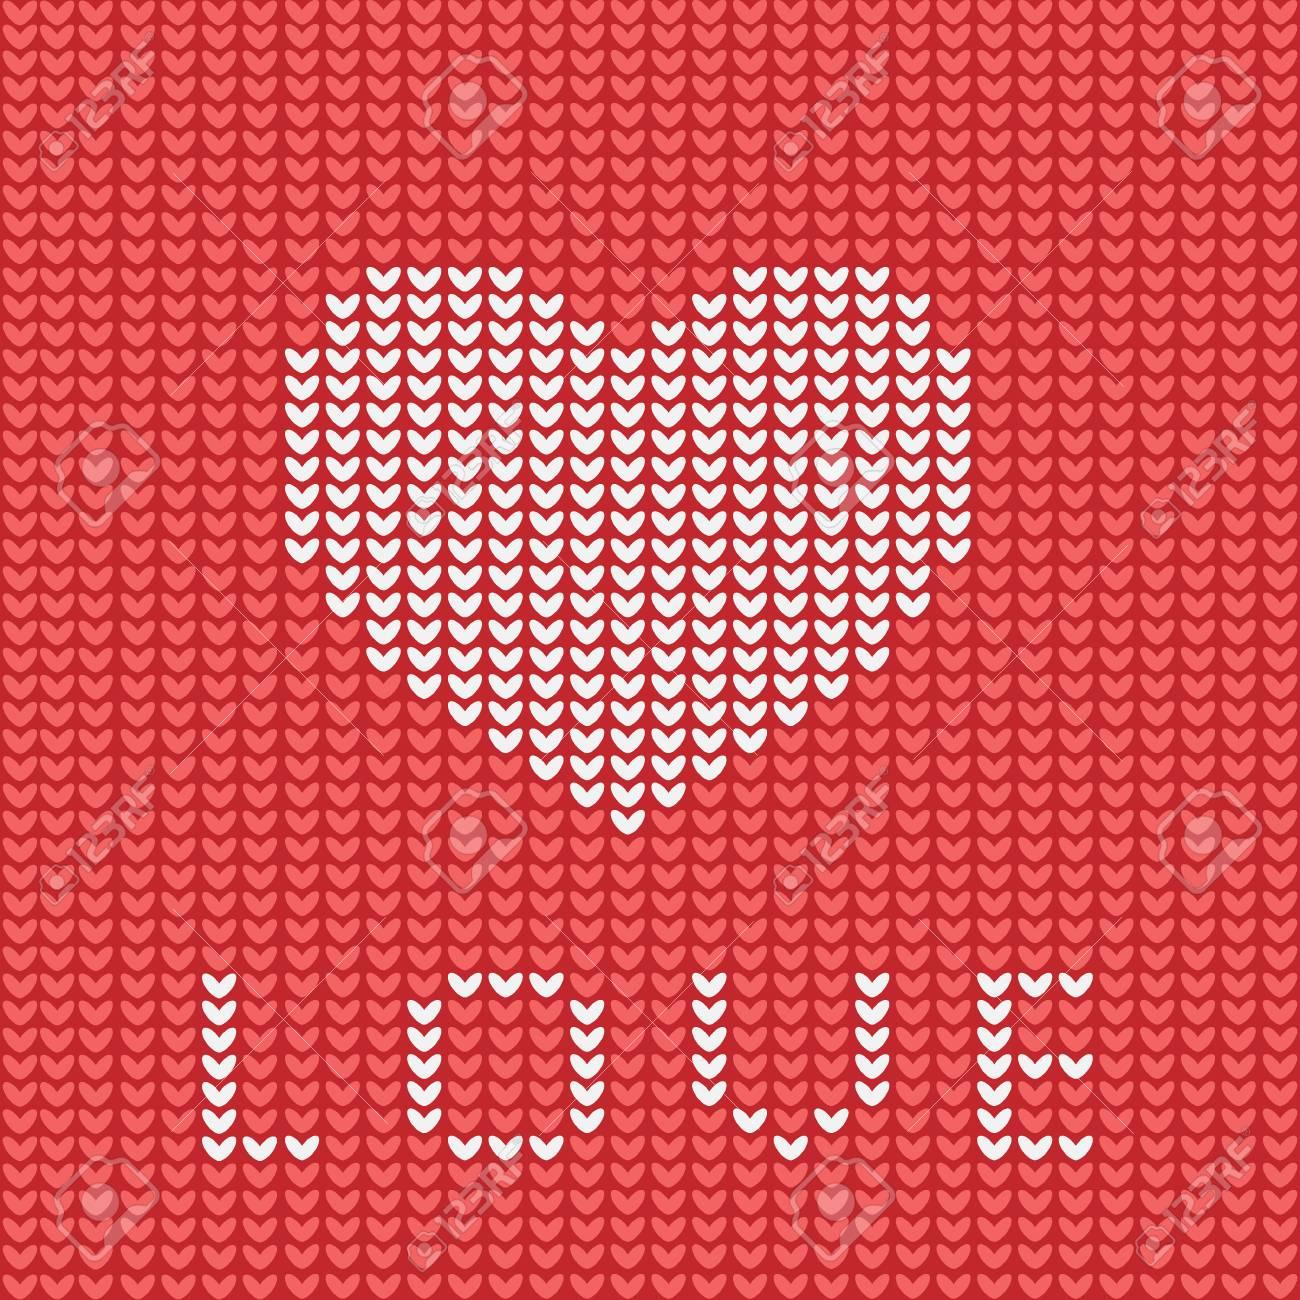 Knitting Is Love. Knitted Heart Symbol. Modern Vector Knitting ...